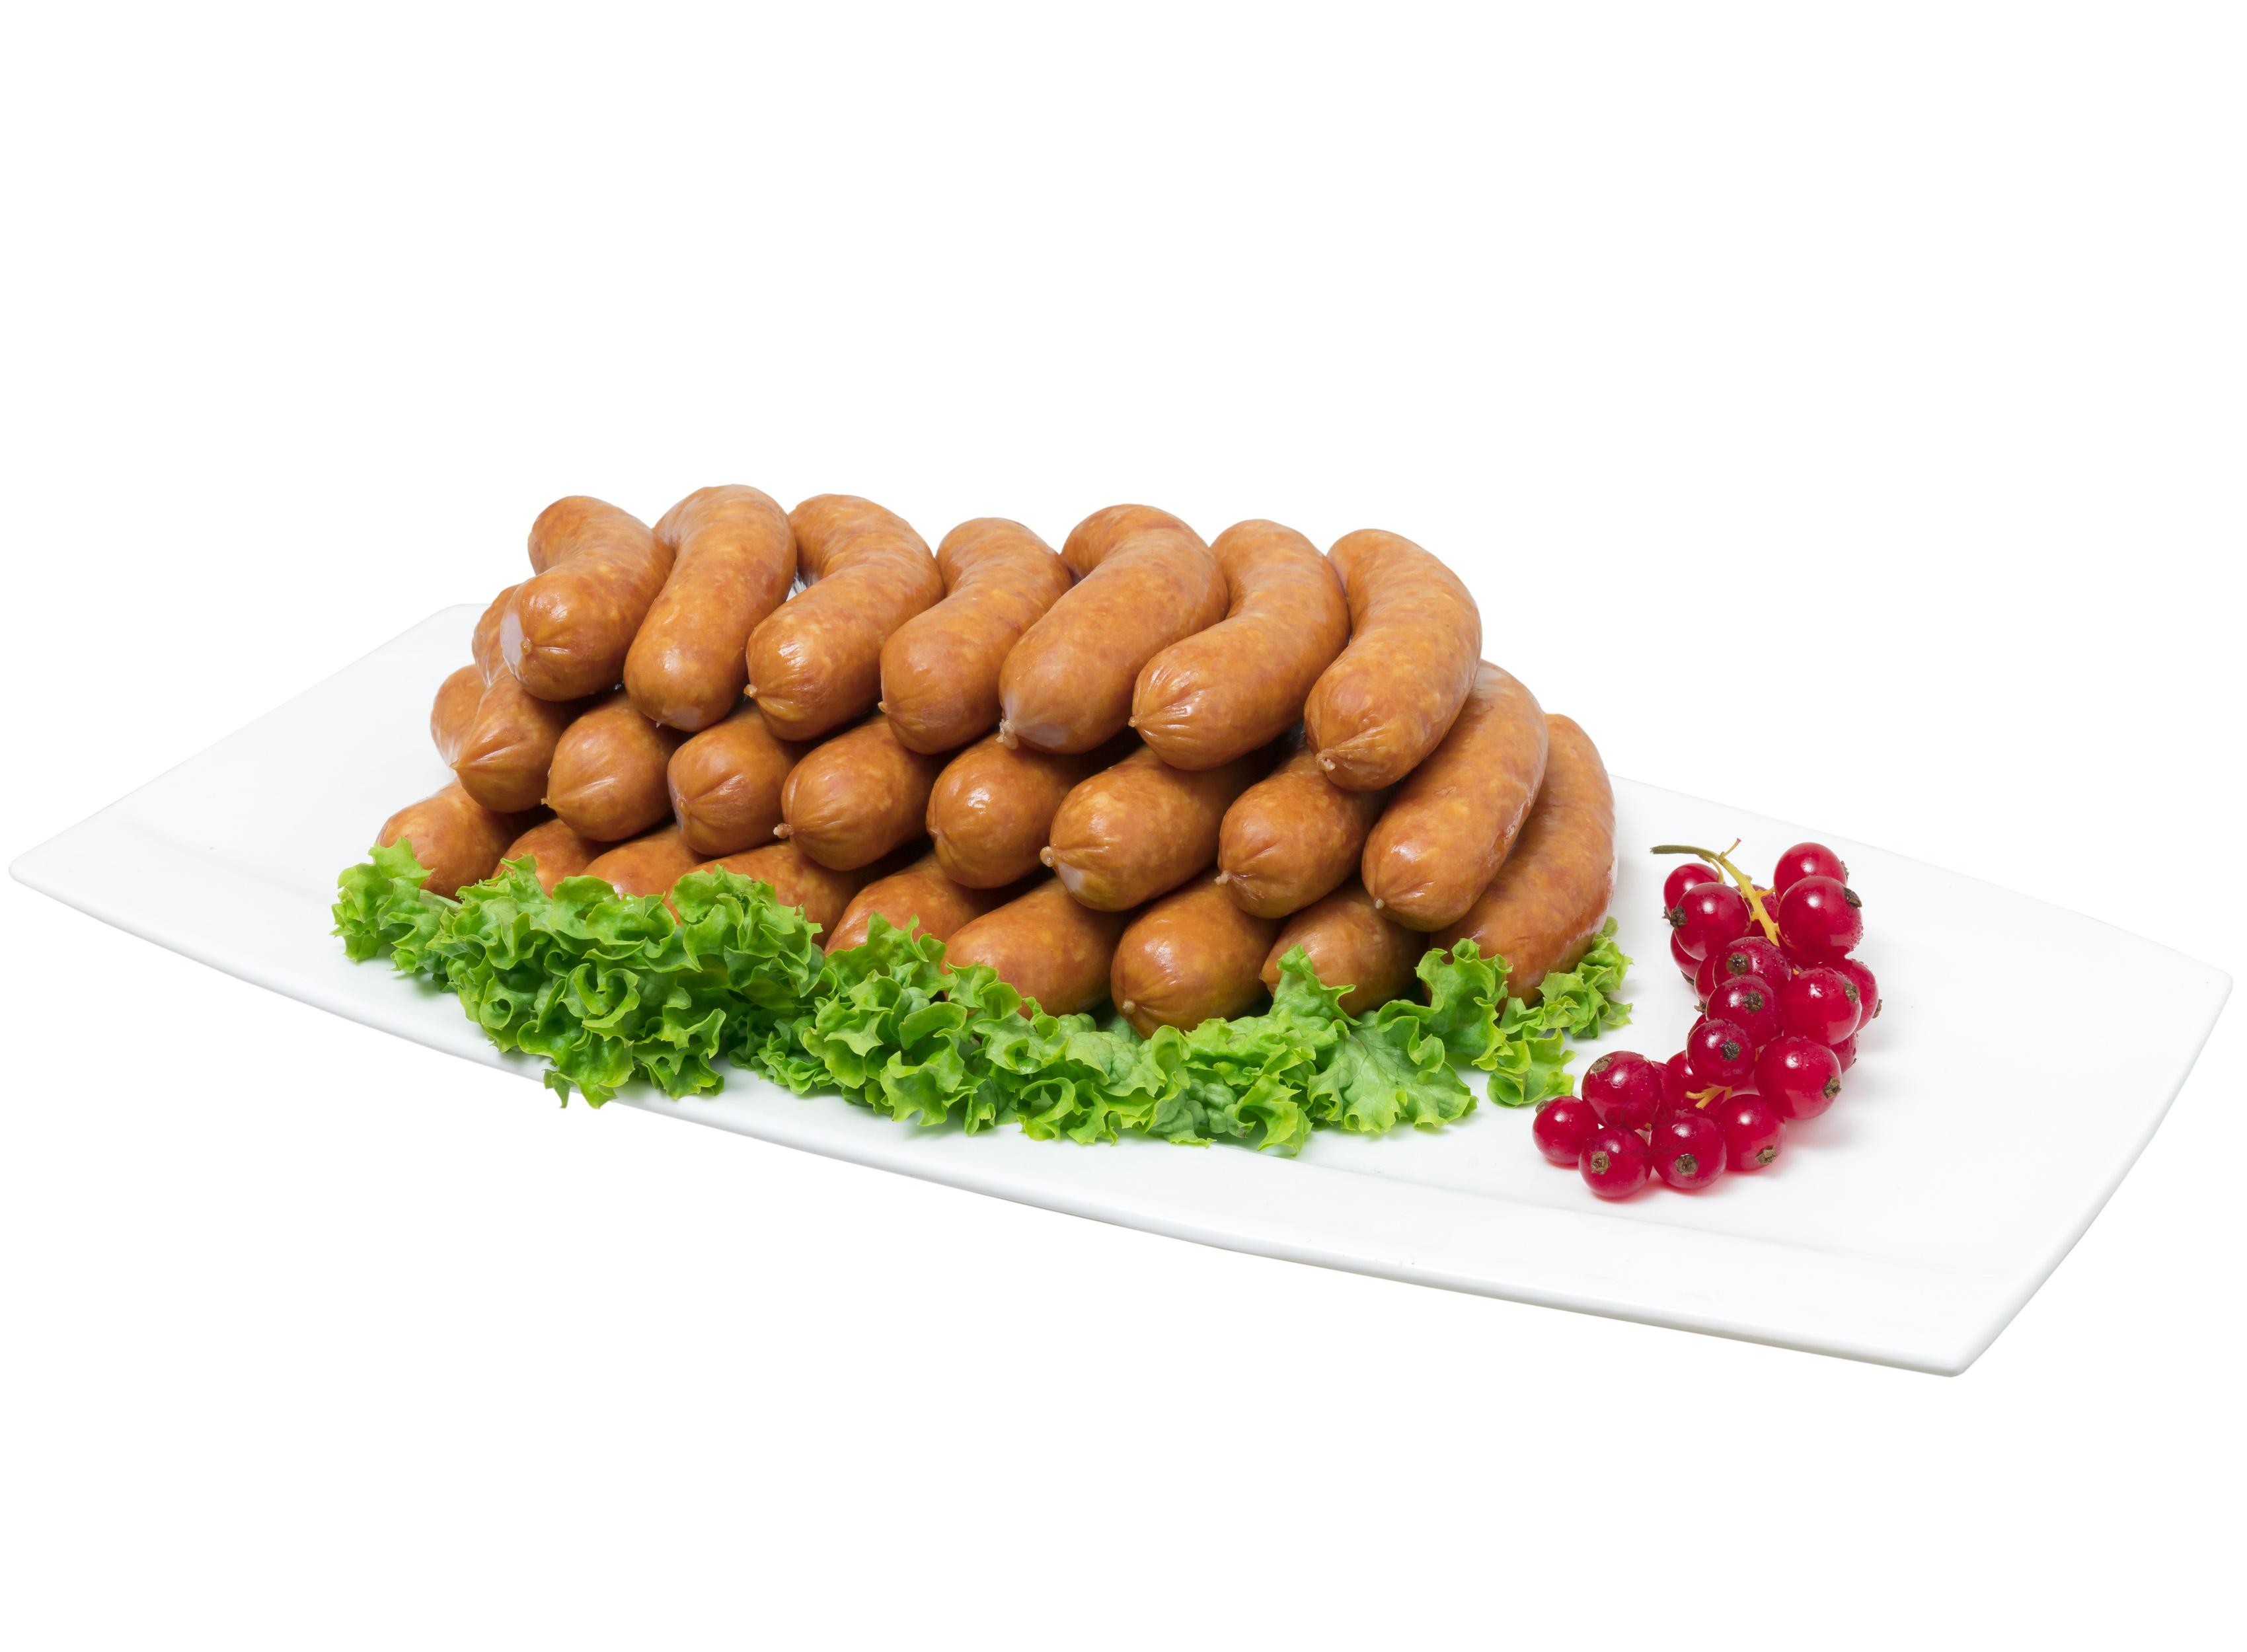 Poliwczak Kornetki - delikate Würstchen 0,5Kg